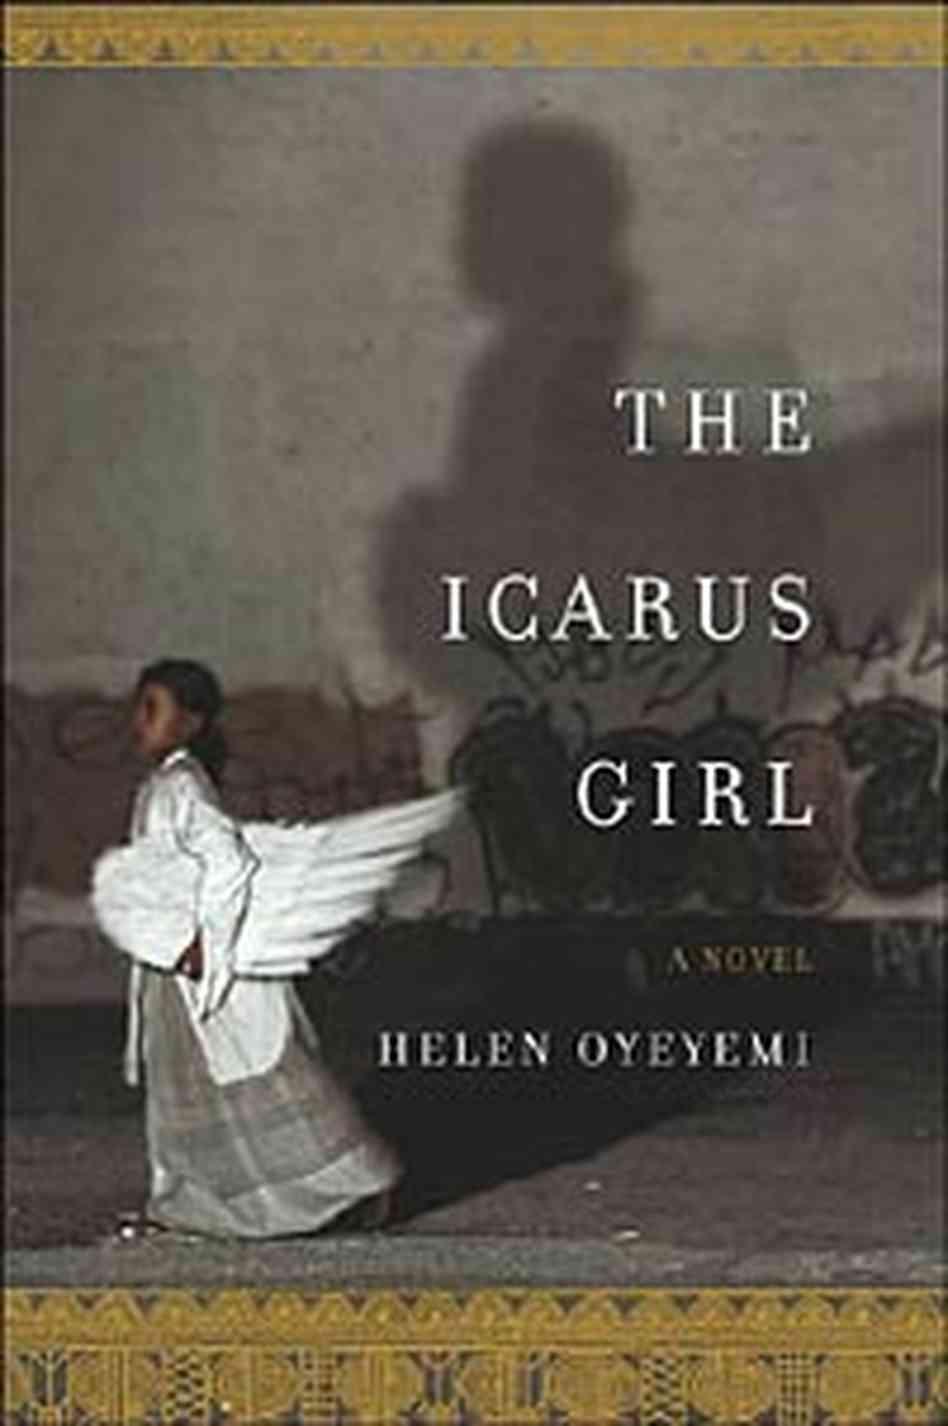 Icarus-Girl